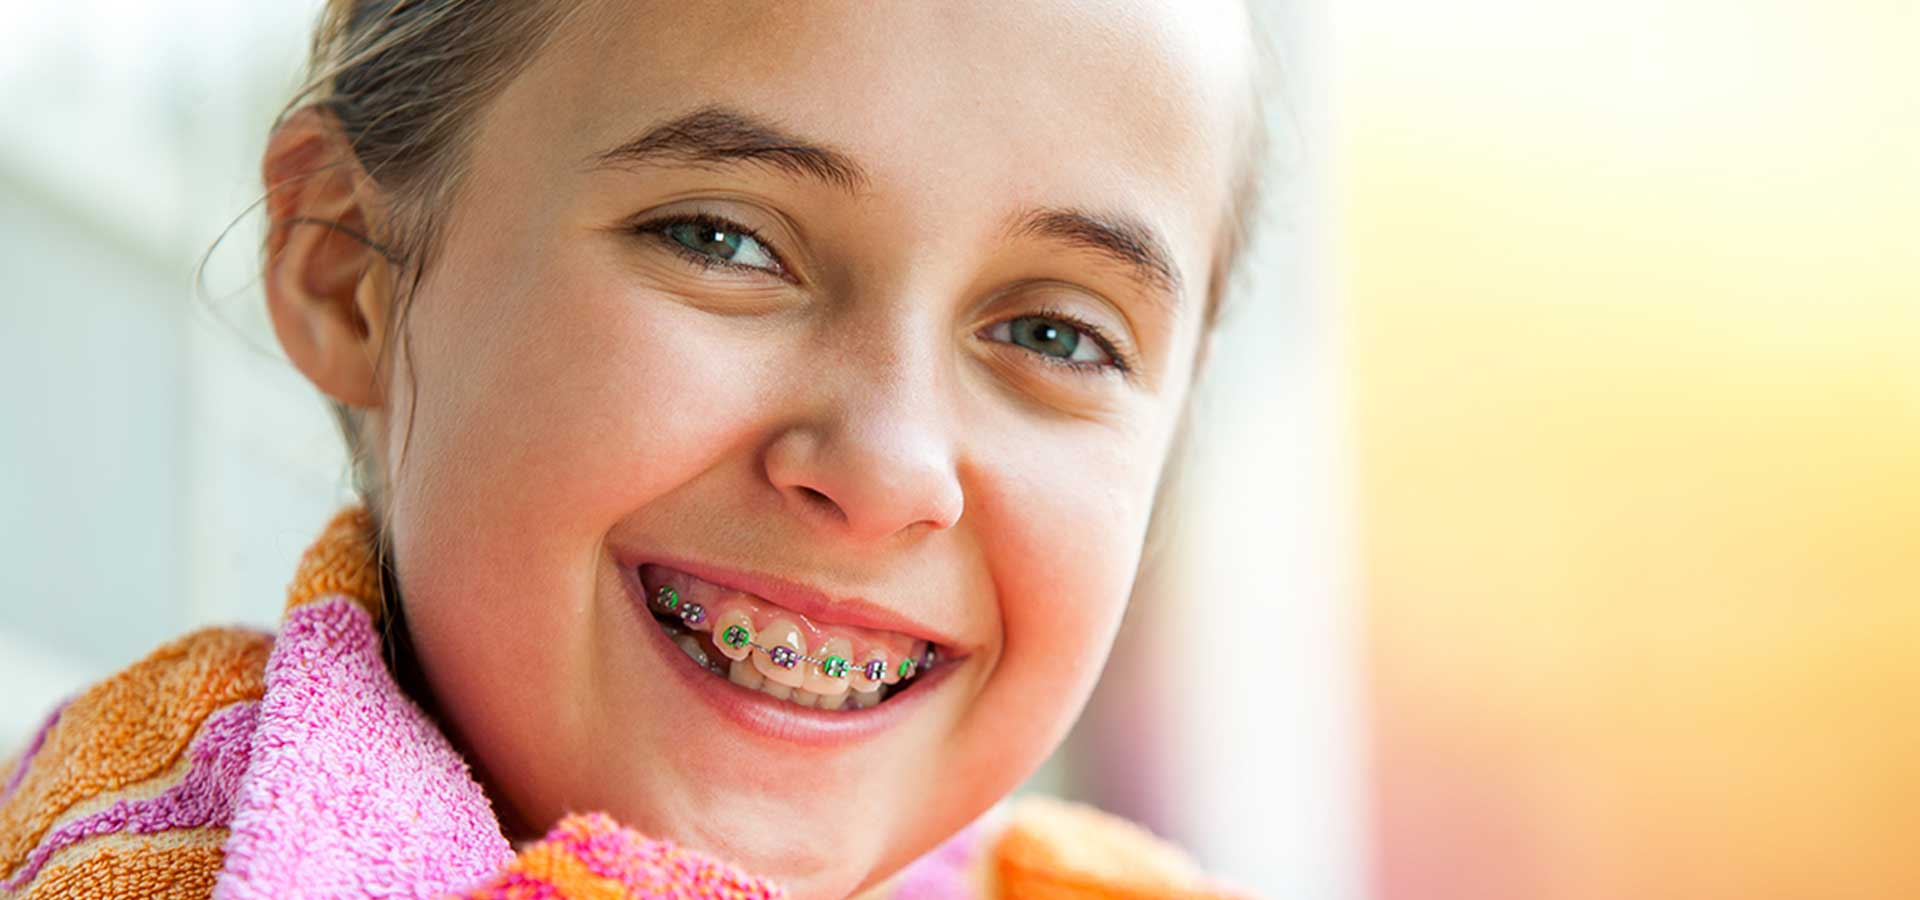 Children's Braces | Tooth Suite Family Dentistry | General Dentist | Lloydminster